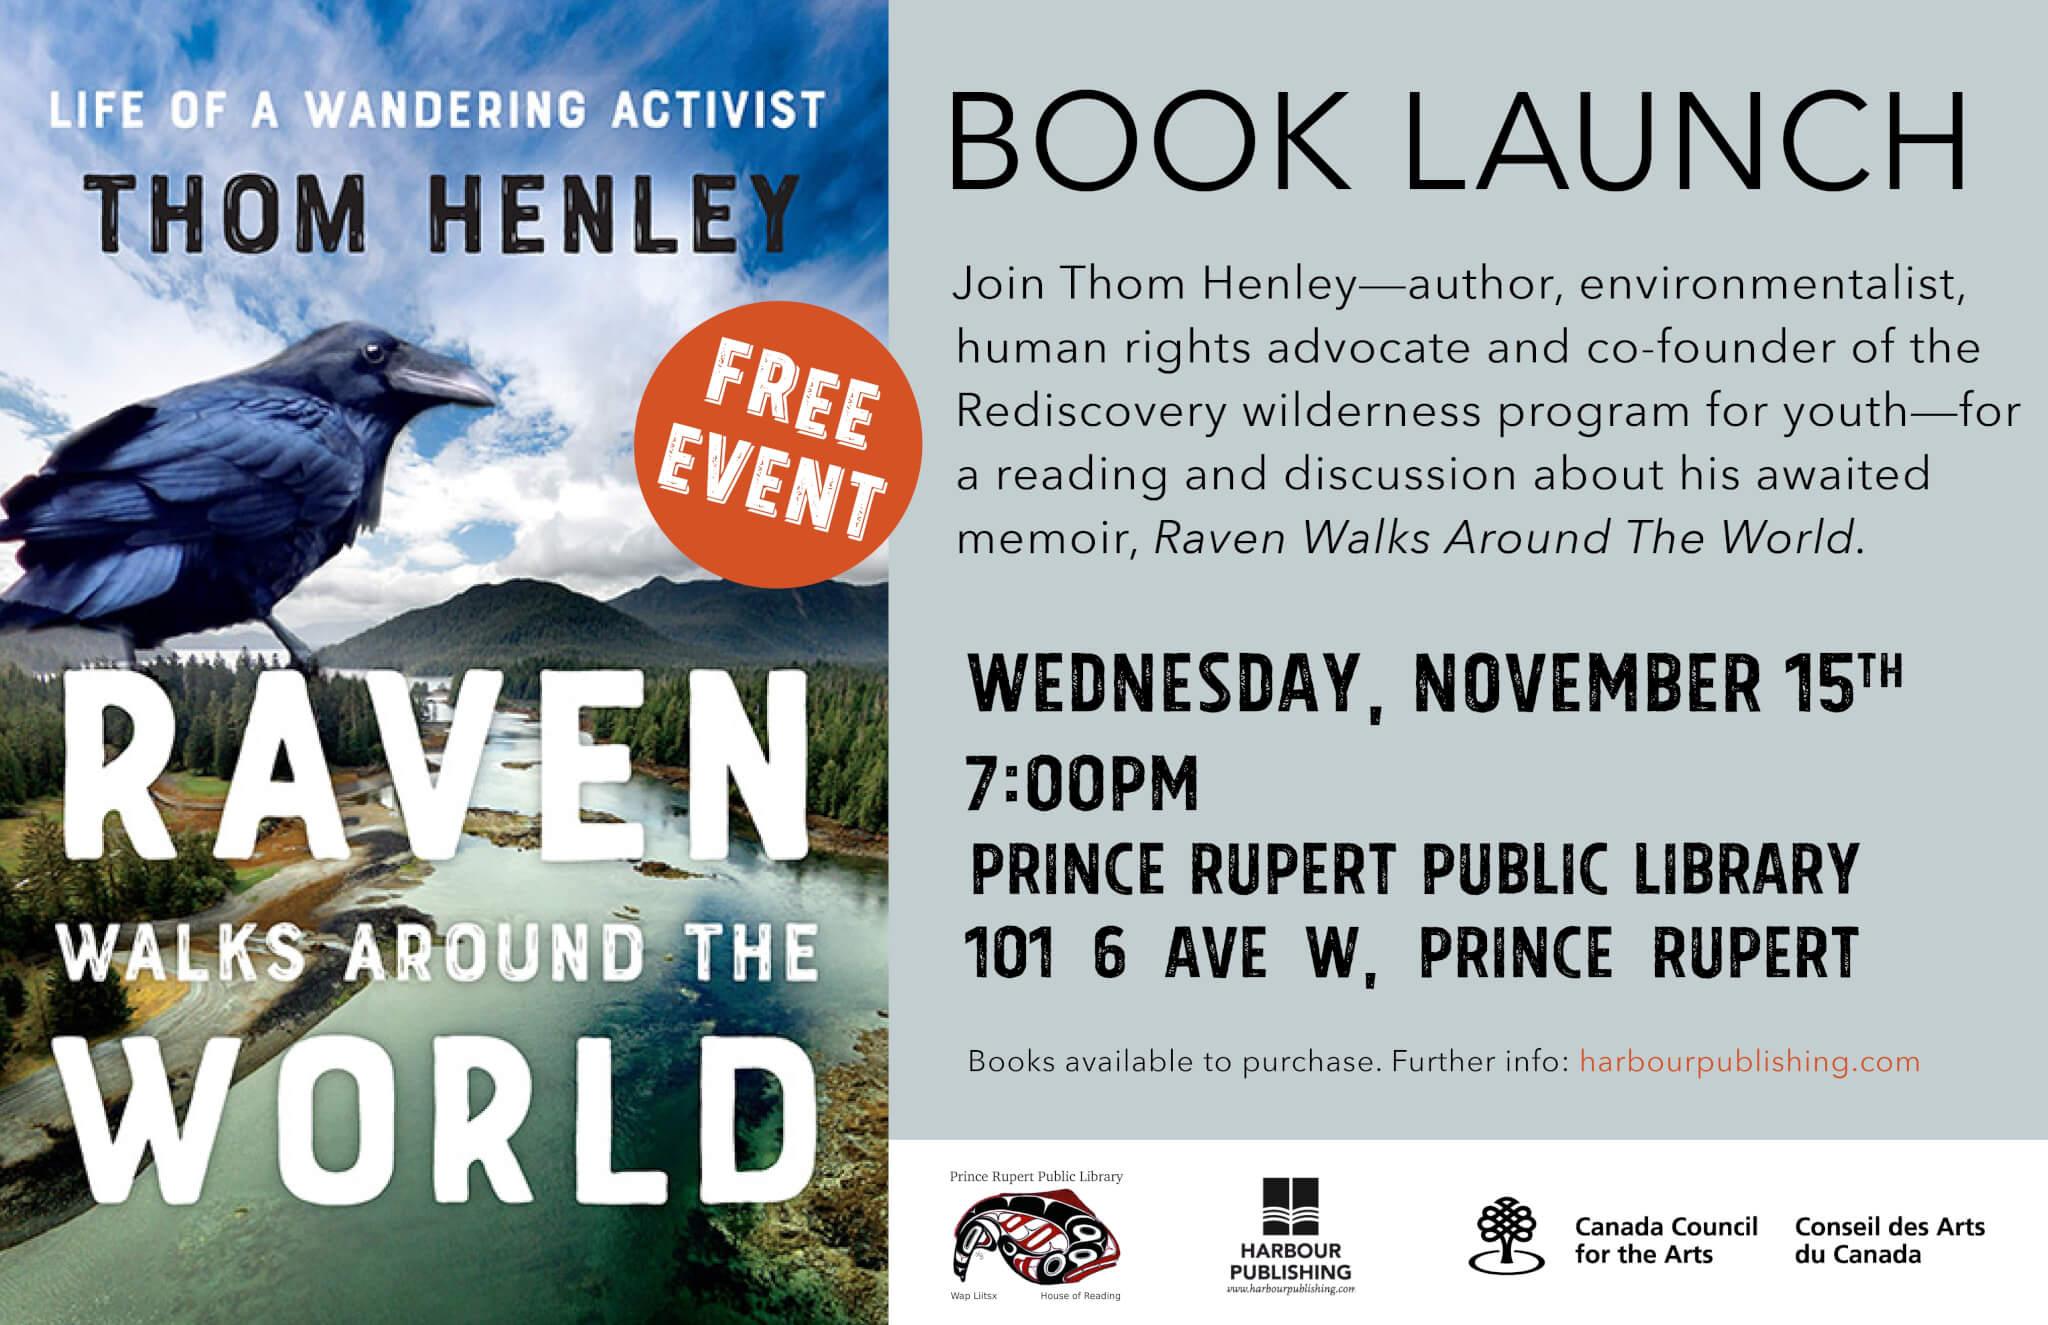 Book event – Prince Rupert Library – November 15 – 7:00 p.m